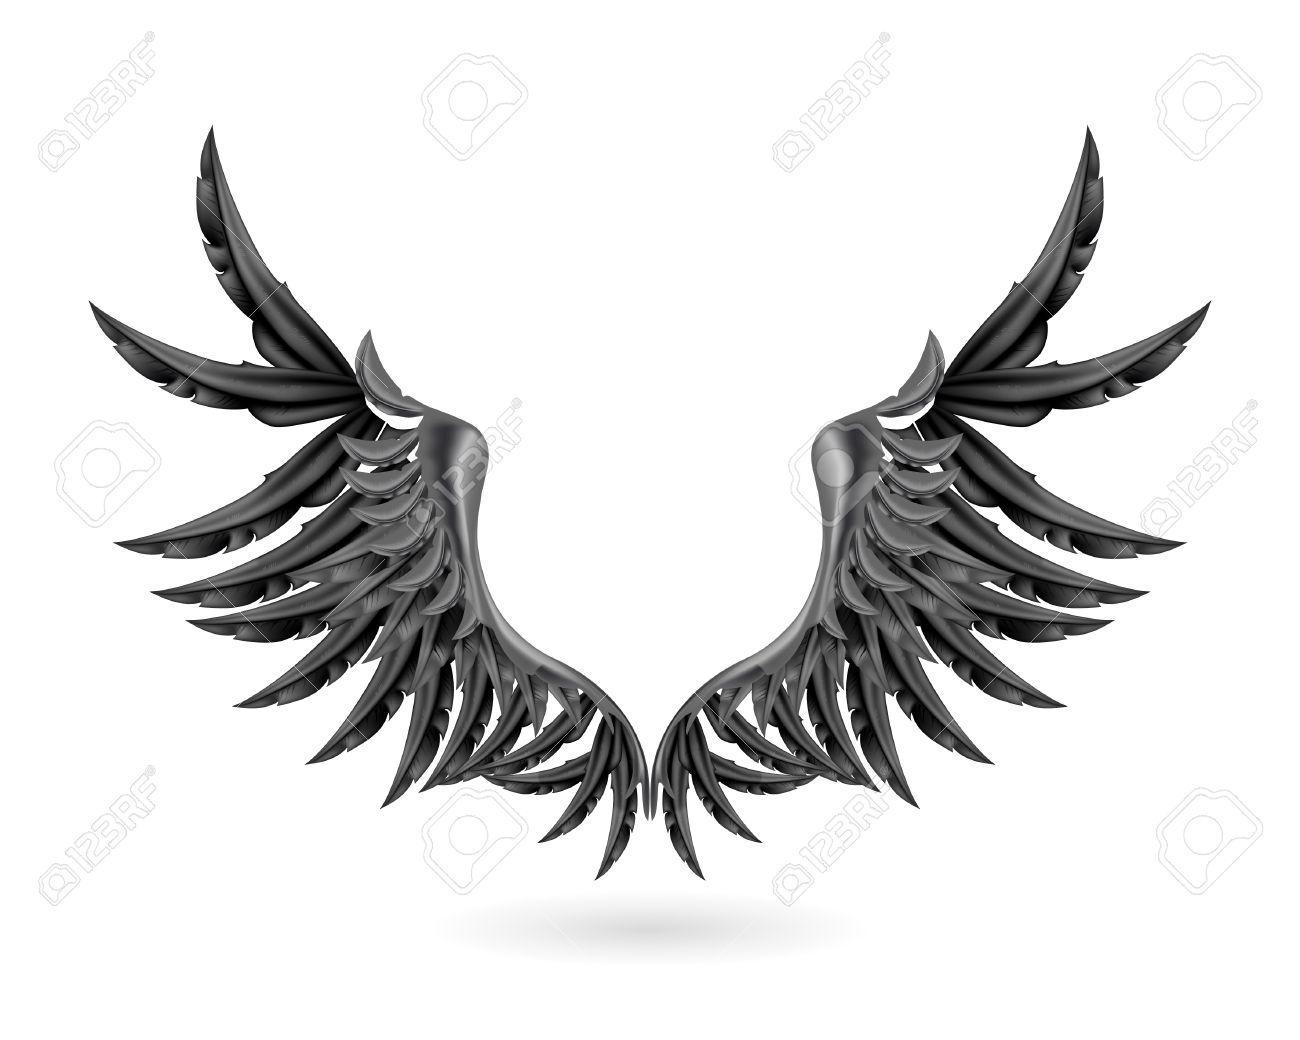 1300x1040 Raven Feather Clipart, Explore Pictures